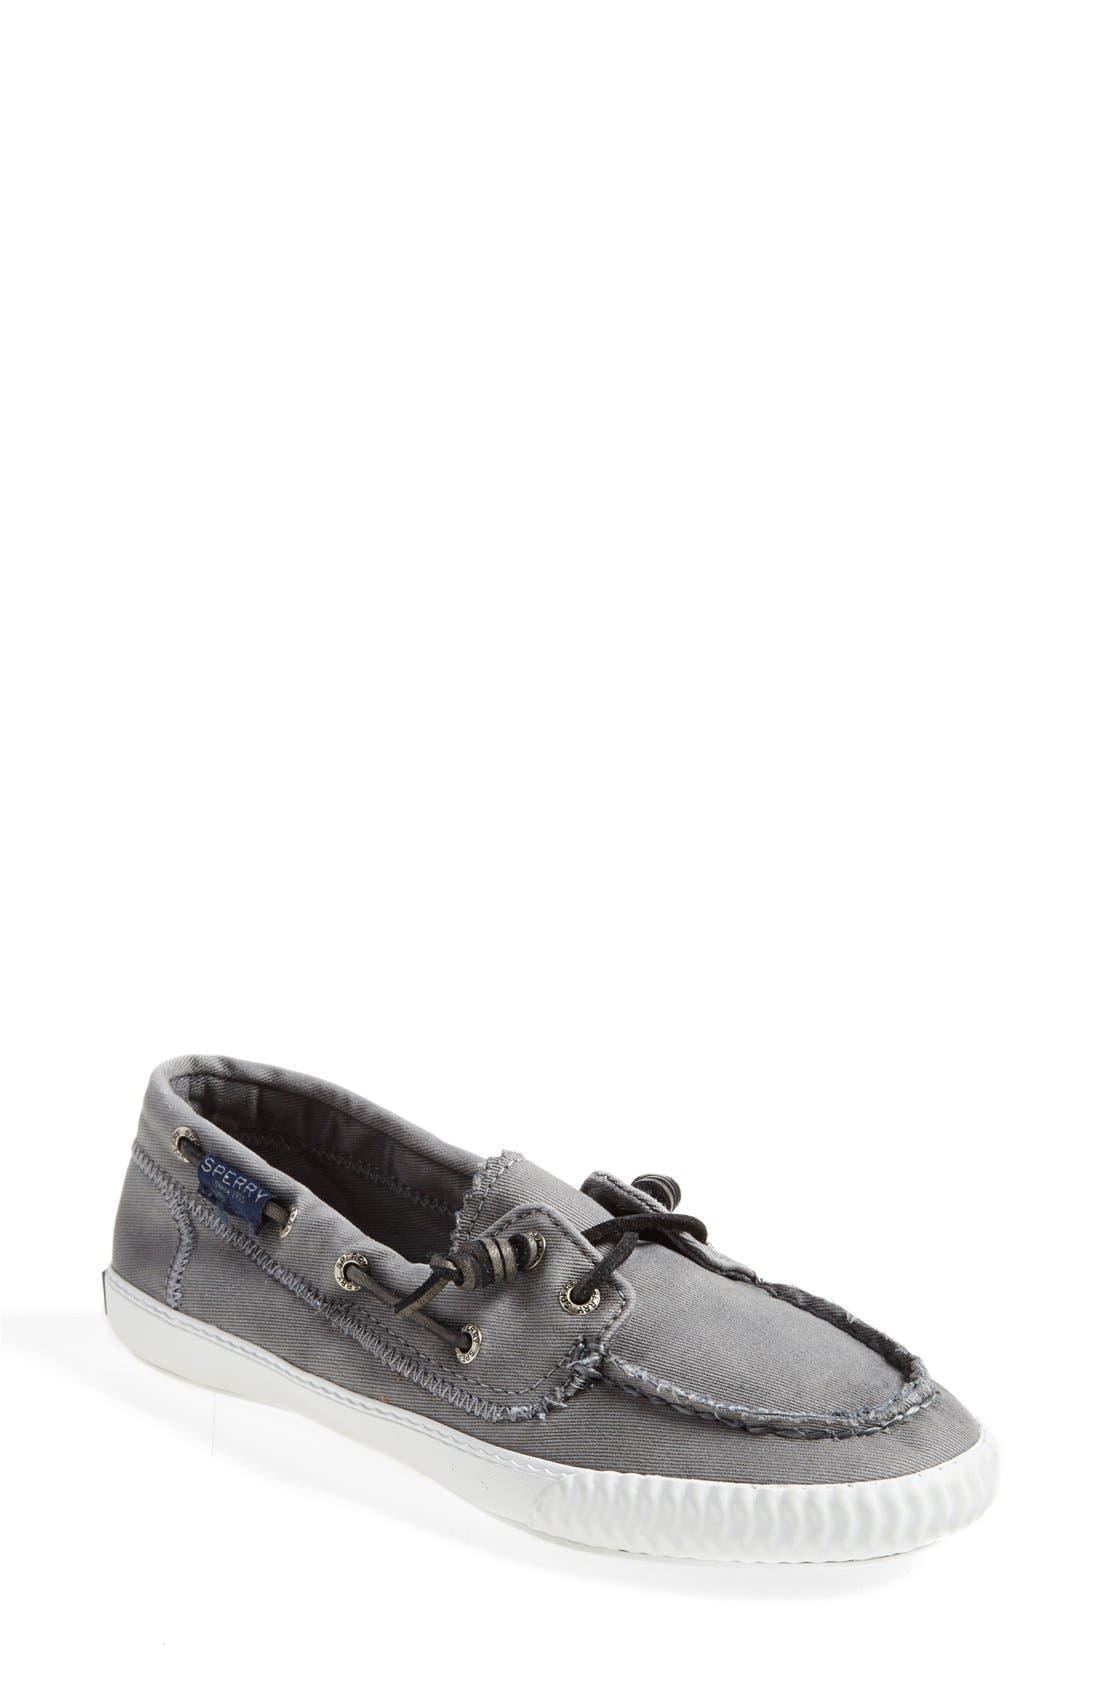 Paul Sperry 'Sayel Away' Sneaker,                         Main,                         color, GREY